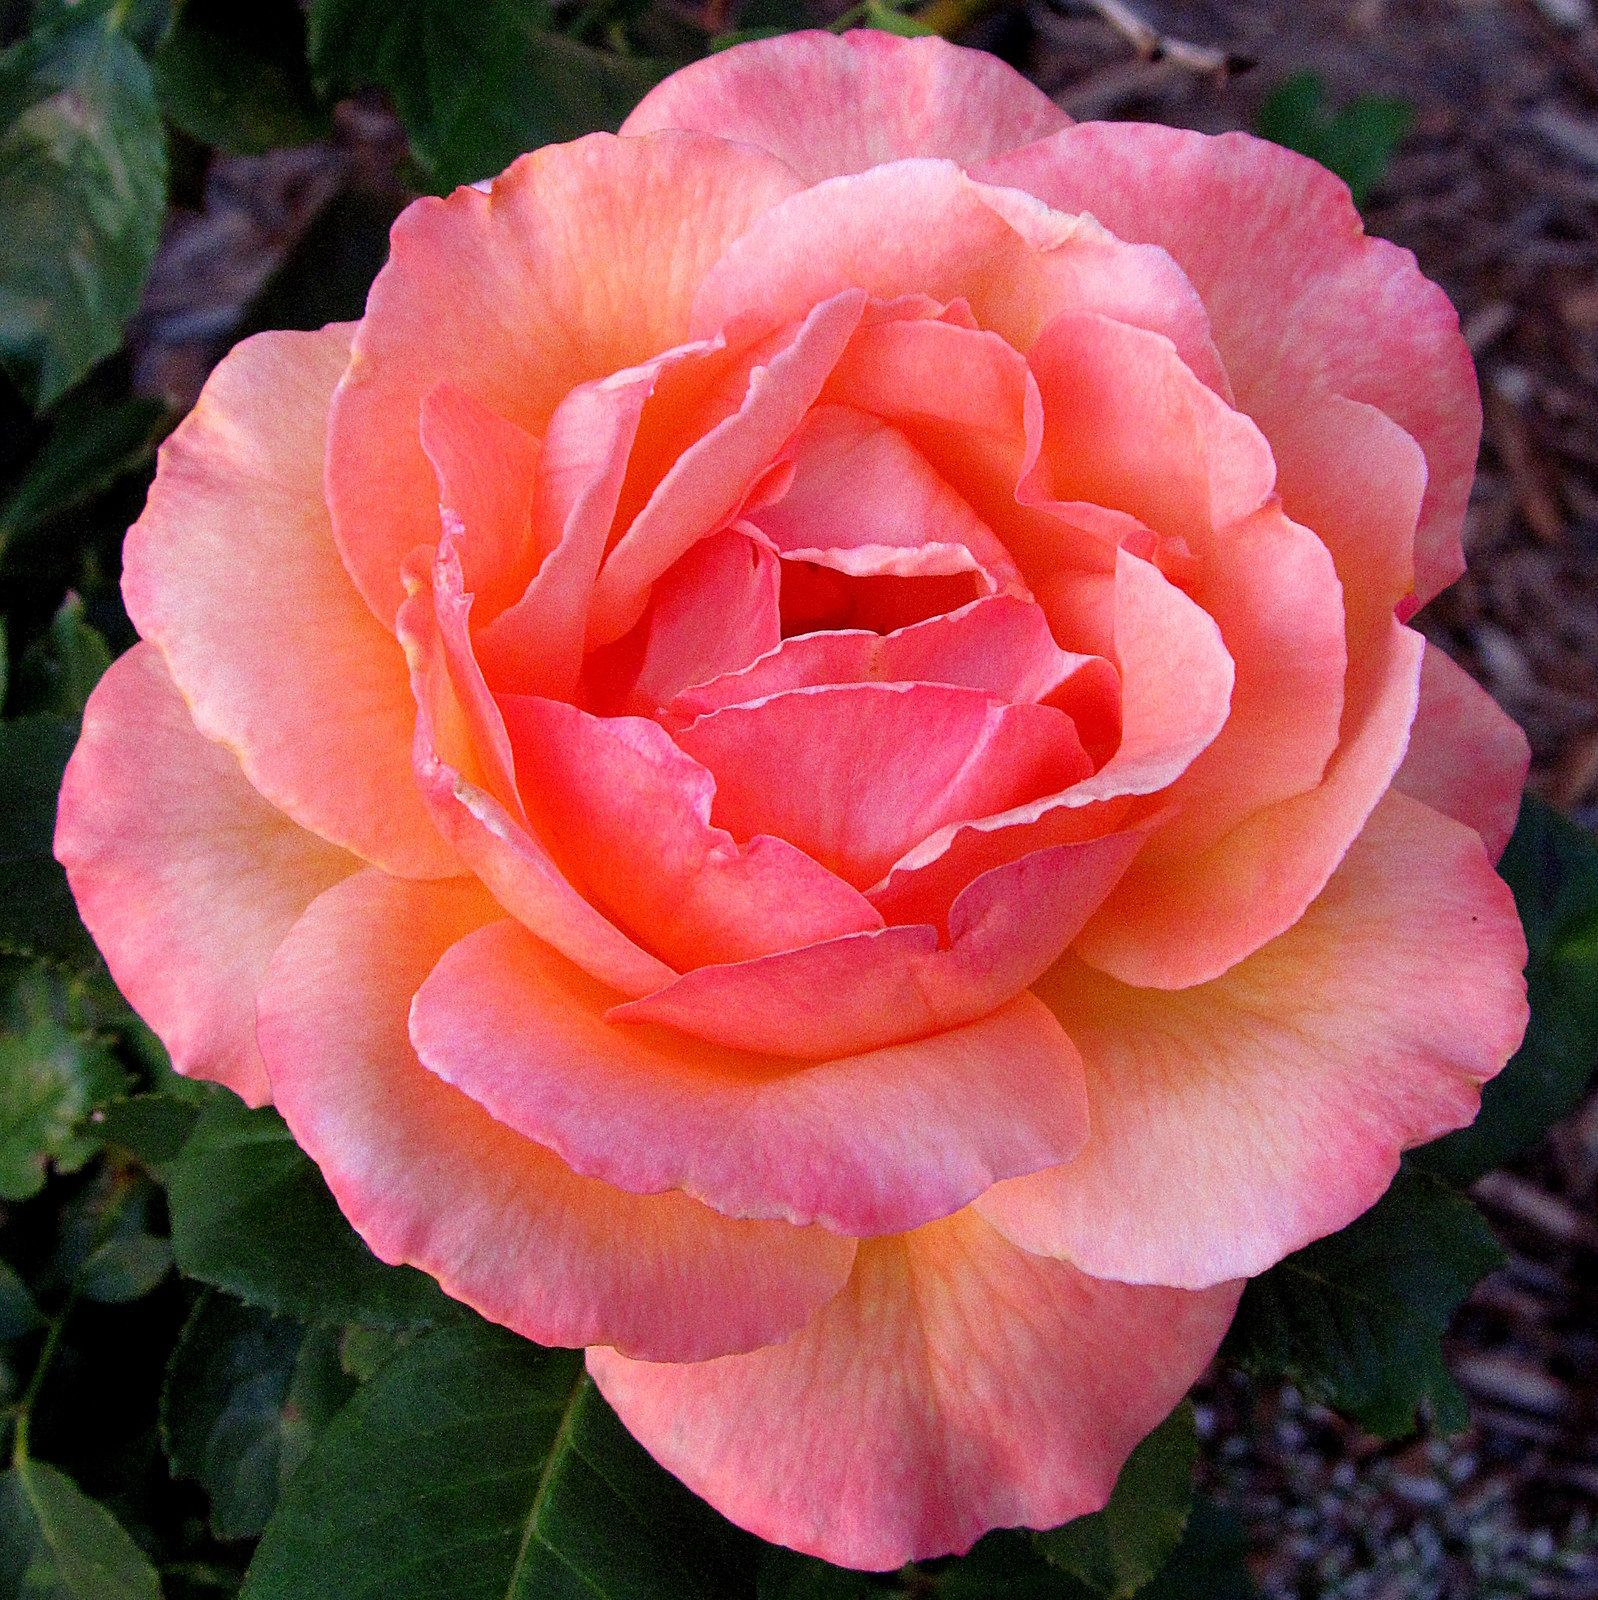 PhotographyByRoger: # 19 Pink Rose